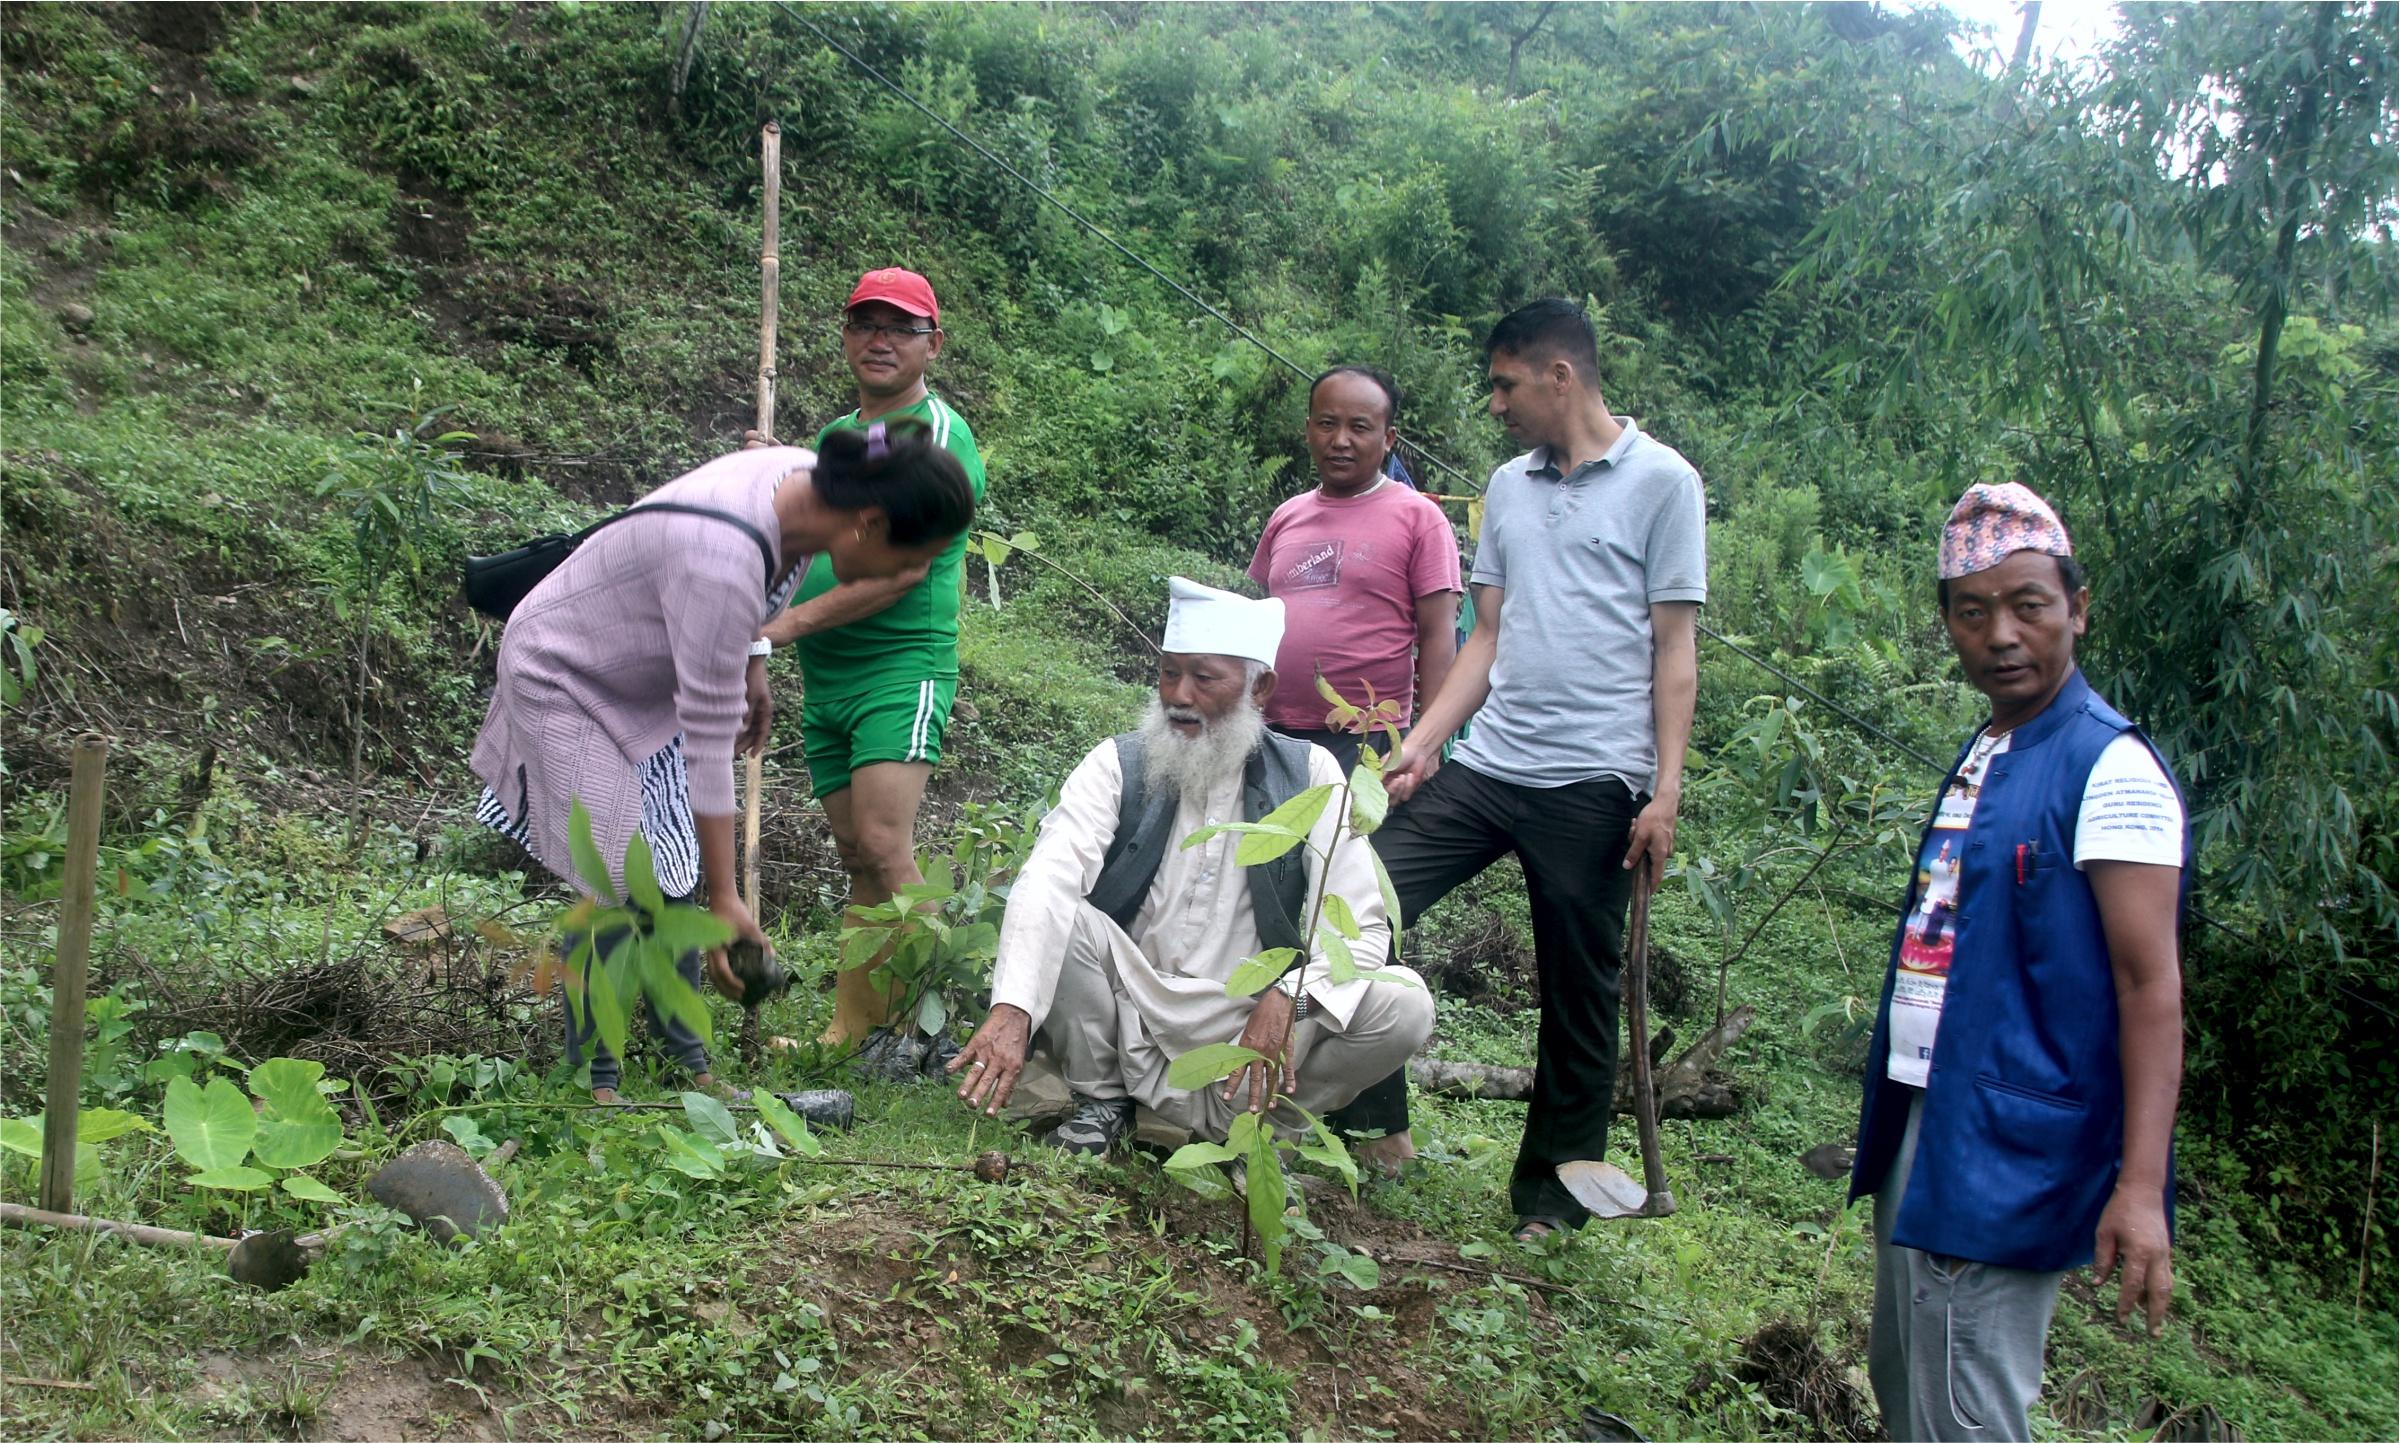 'माङगेन्ना र माङसेबुङ सहकारीद्धारा माङसेबुङमा वृक्षारोपण (फोटो फिचर सहित)